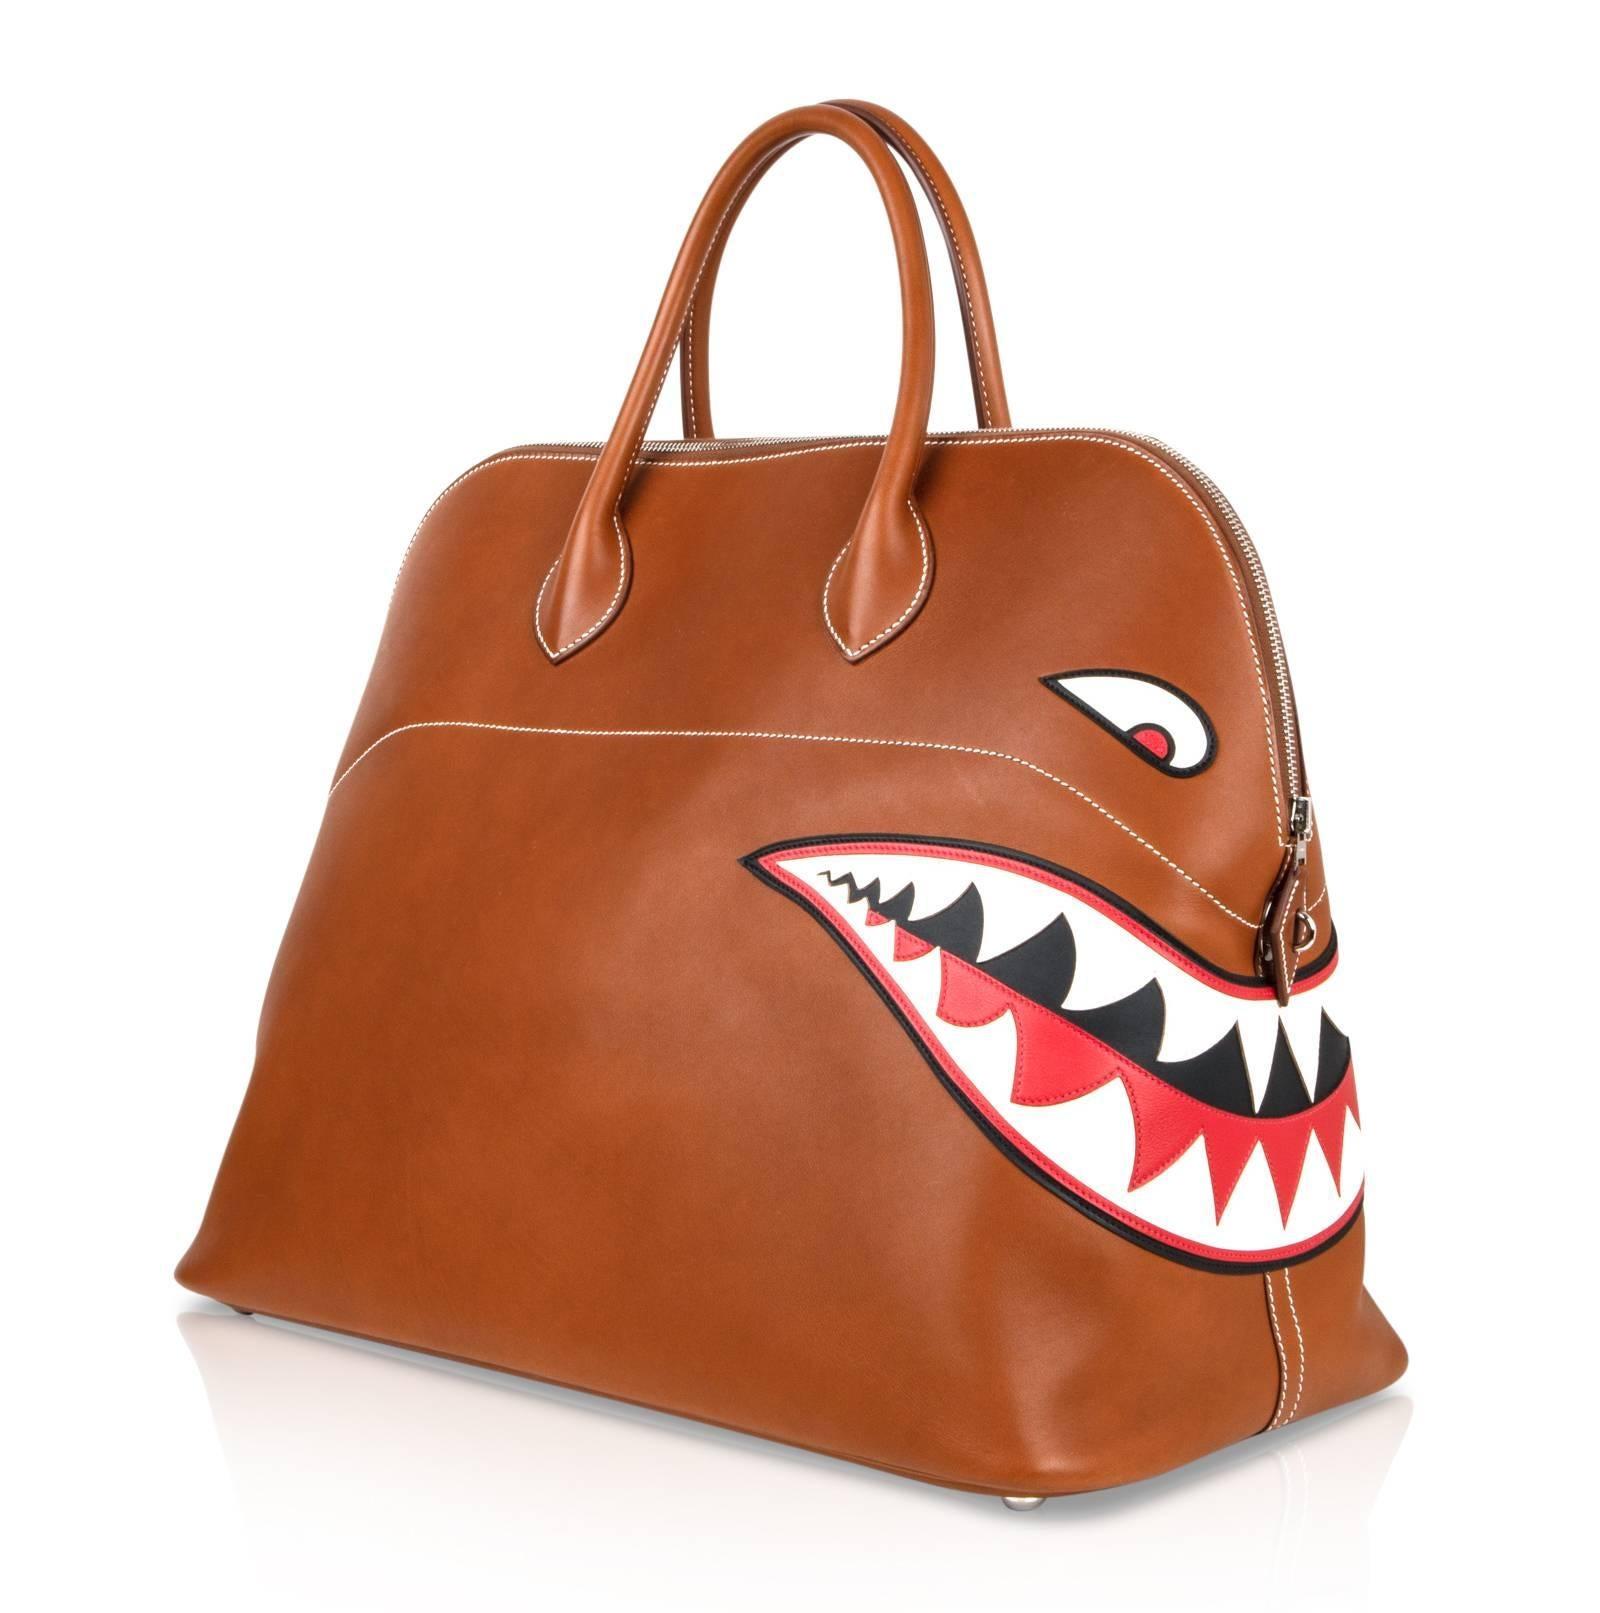 42aaa9cd3d11 ... coupon code for brown hermes barenia leather ltd ed runway shark bolide  monster bag for sale ...